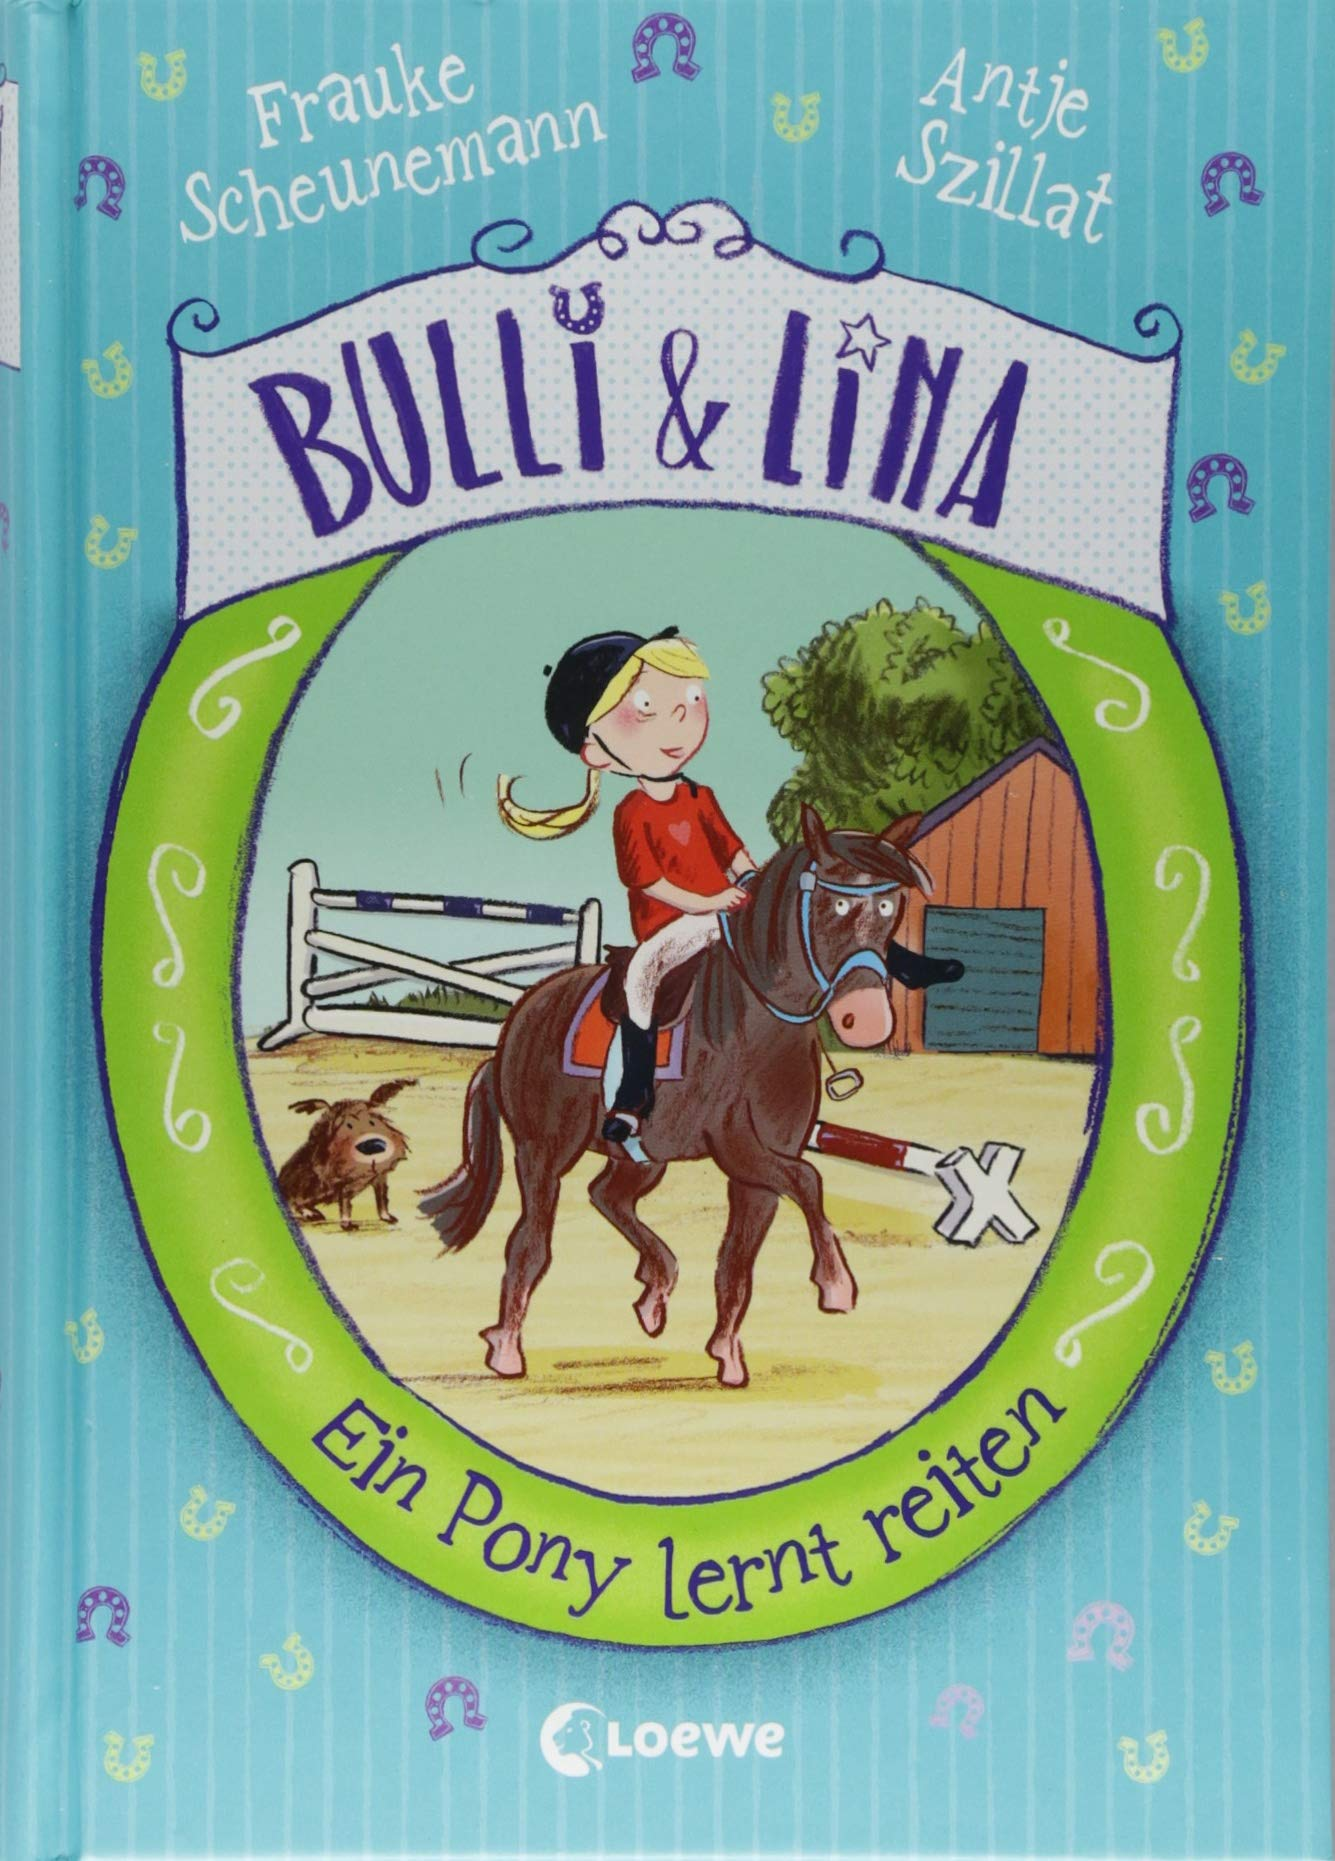 Bulli & Lina - Ein Pony lernt reiten (Bulli und Lina)